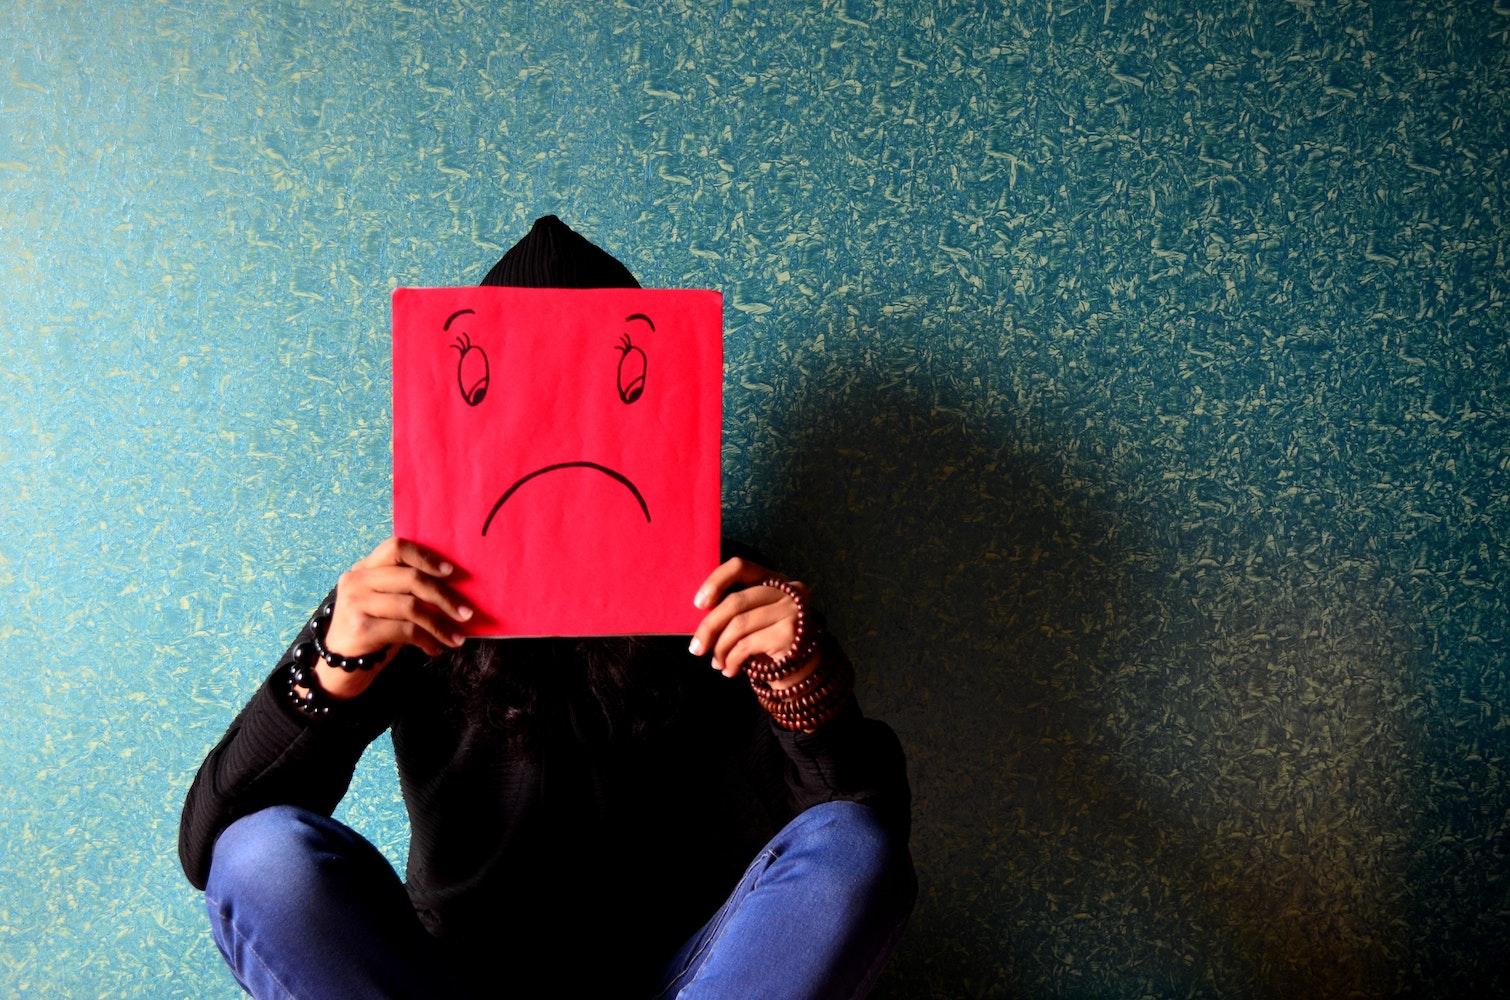 free stock photos of depression pexels